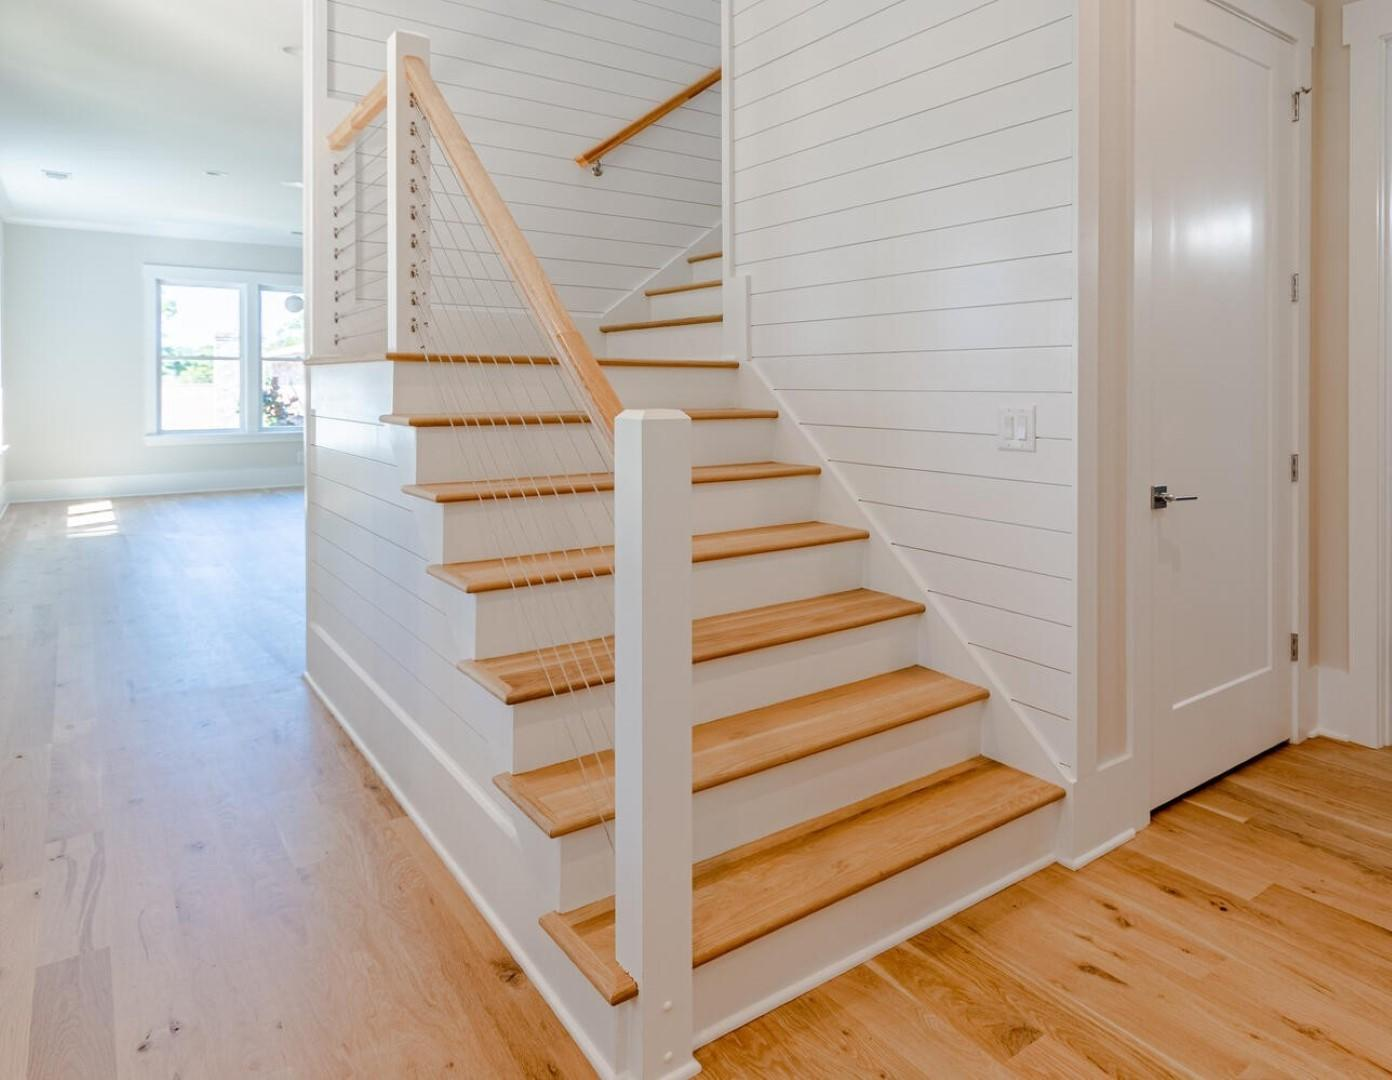 Scanlonville Homes For Sale - 156 5th, Mount Pleasant, SC - 2